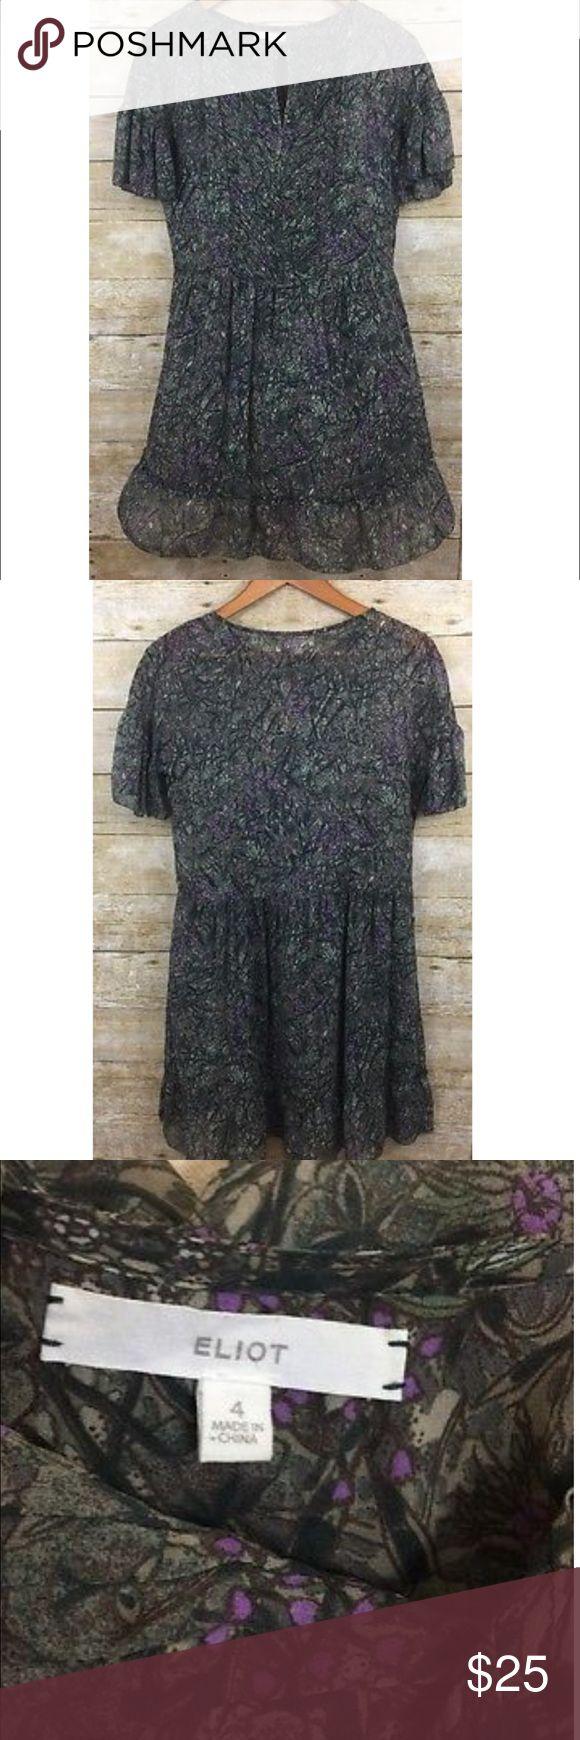 "Madewell Eliot Chiffon Floral Silk Boho Dress Eliot  Chiffon Dress Womens 4   100% Silk   Armpit to Armpit - 18.5"" Sleeve Length - 5"" Shirt Length - 32.5"" Madewell Dresses"